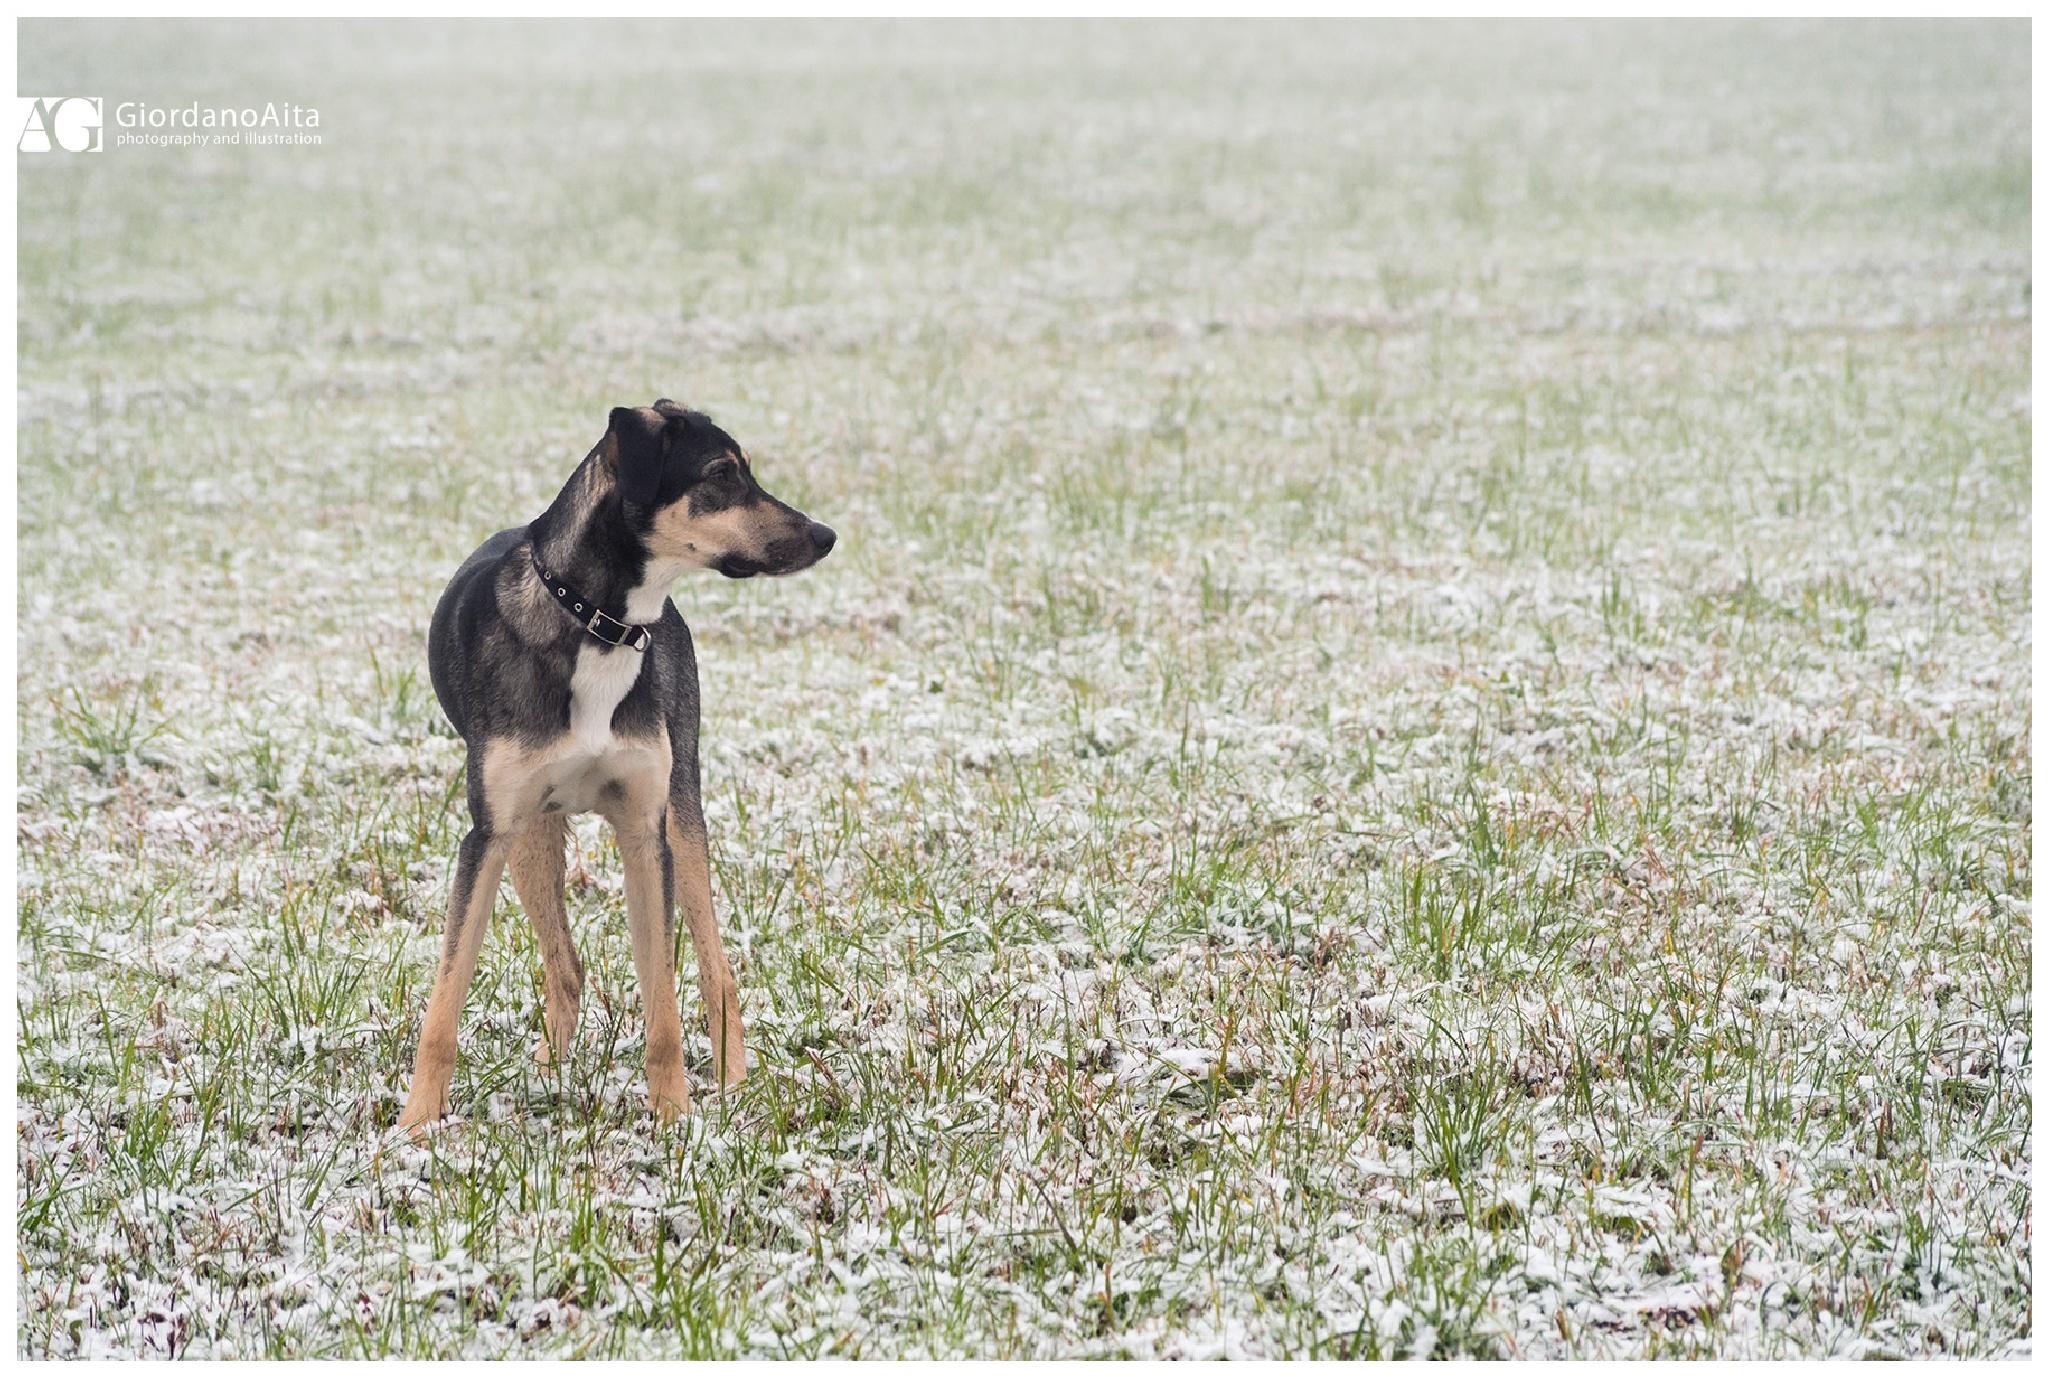 Dog in a snowy field by GiordanoAita